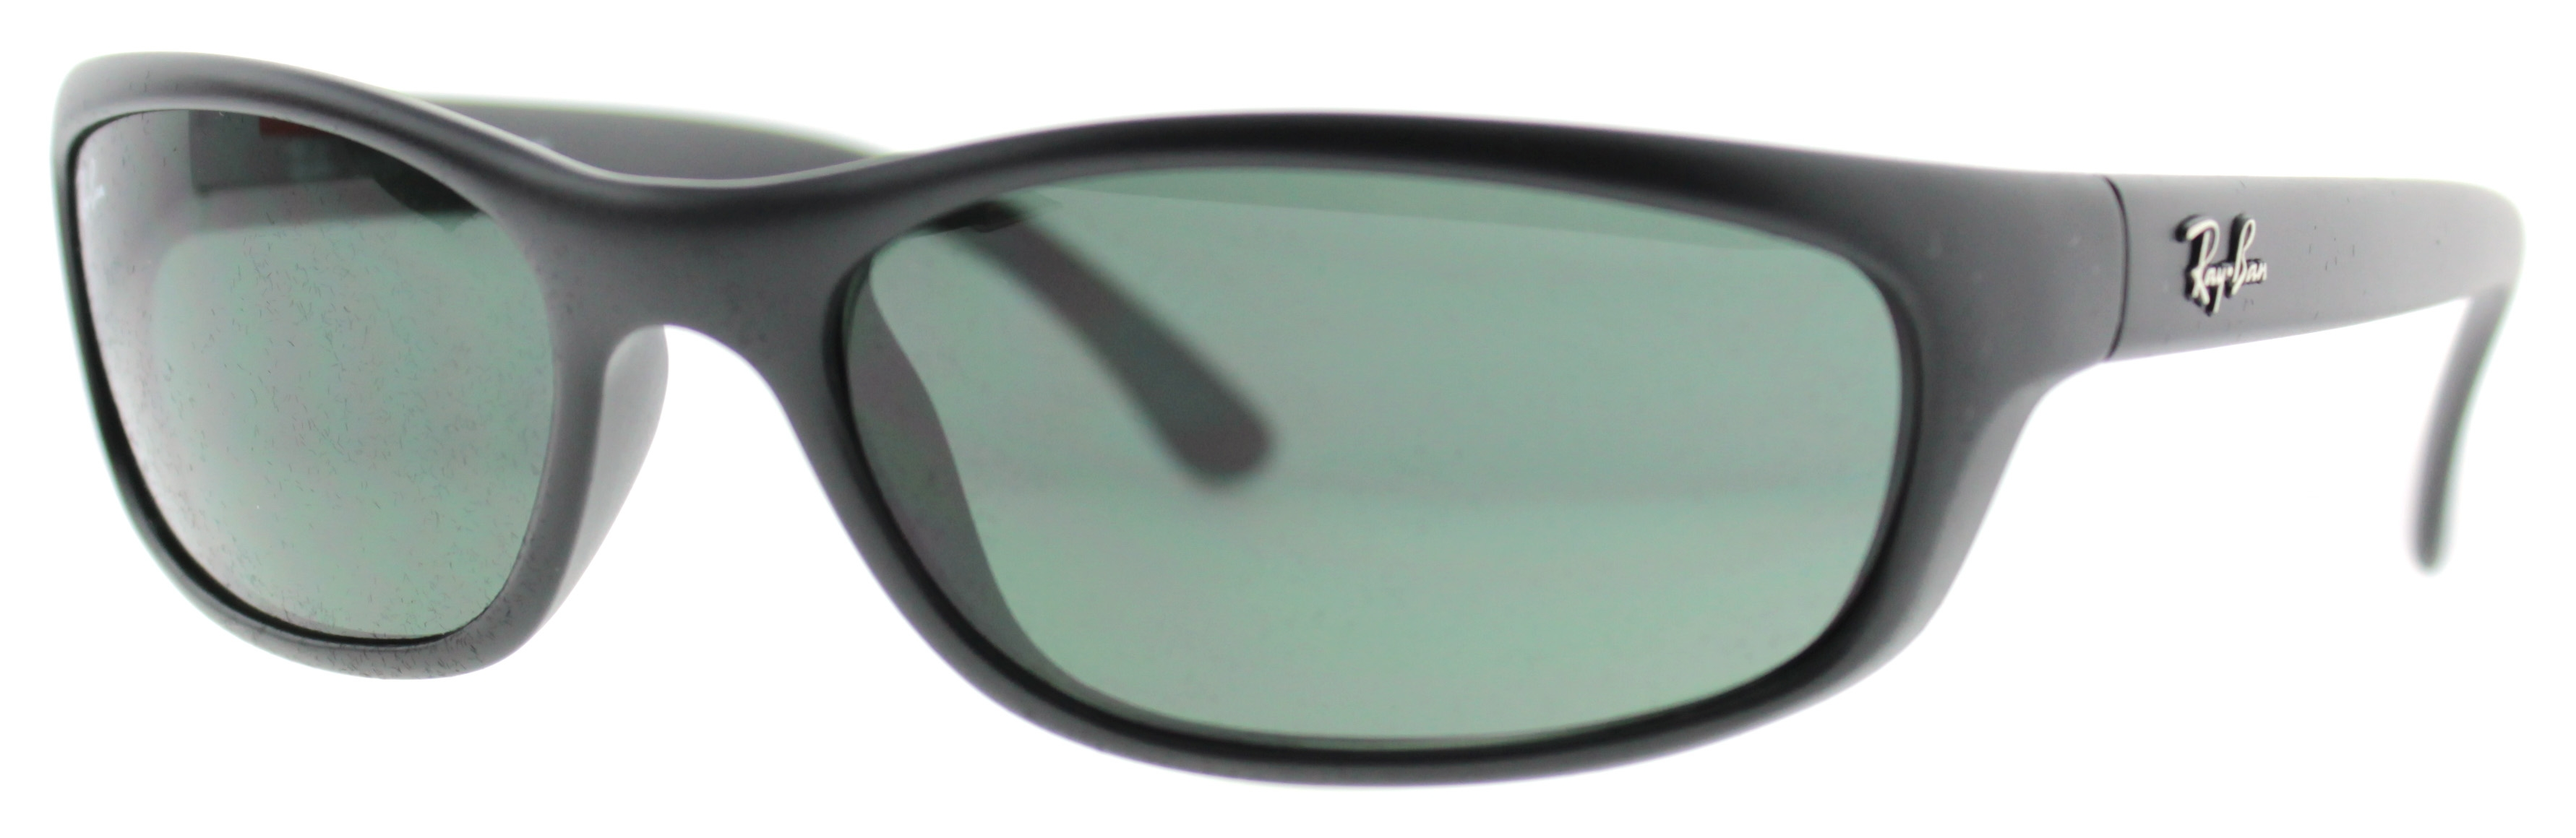 ray ban pilot sunglasses  ray ban rb 4115 601s71